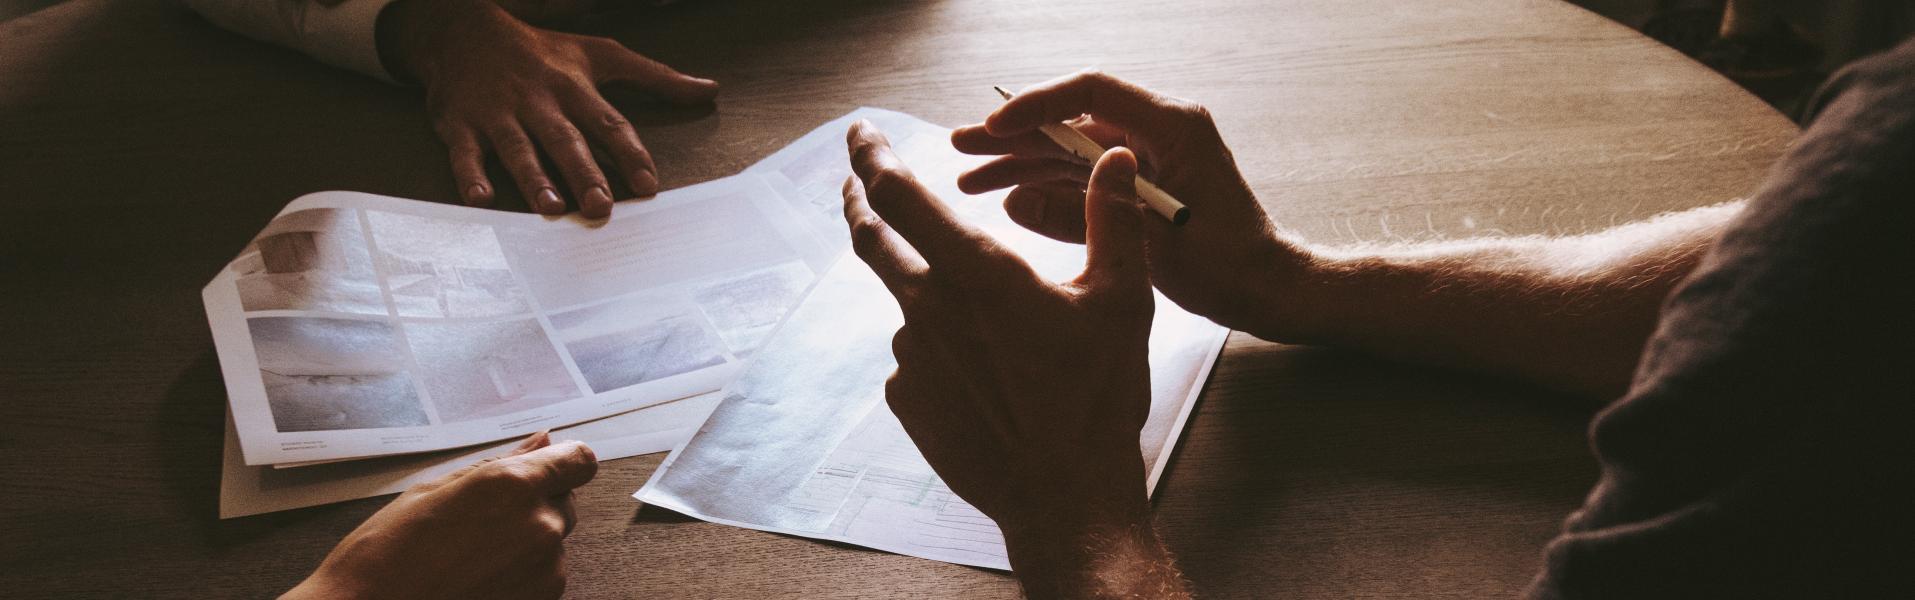 Join the conversation on CIHR's new strategic plan!